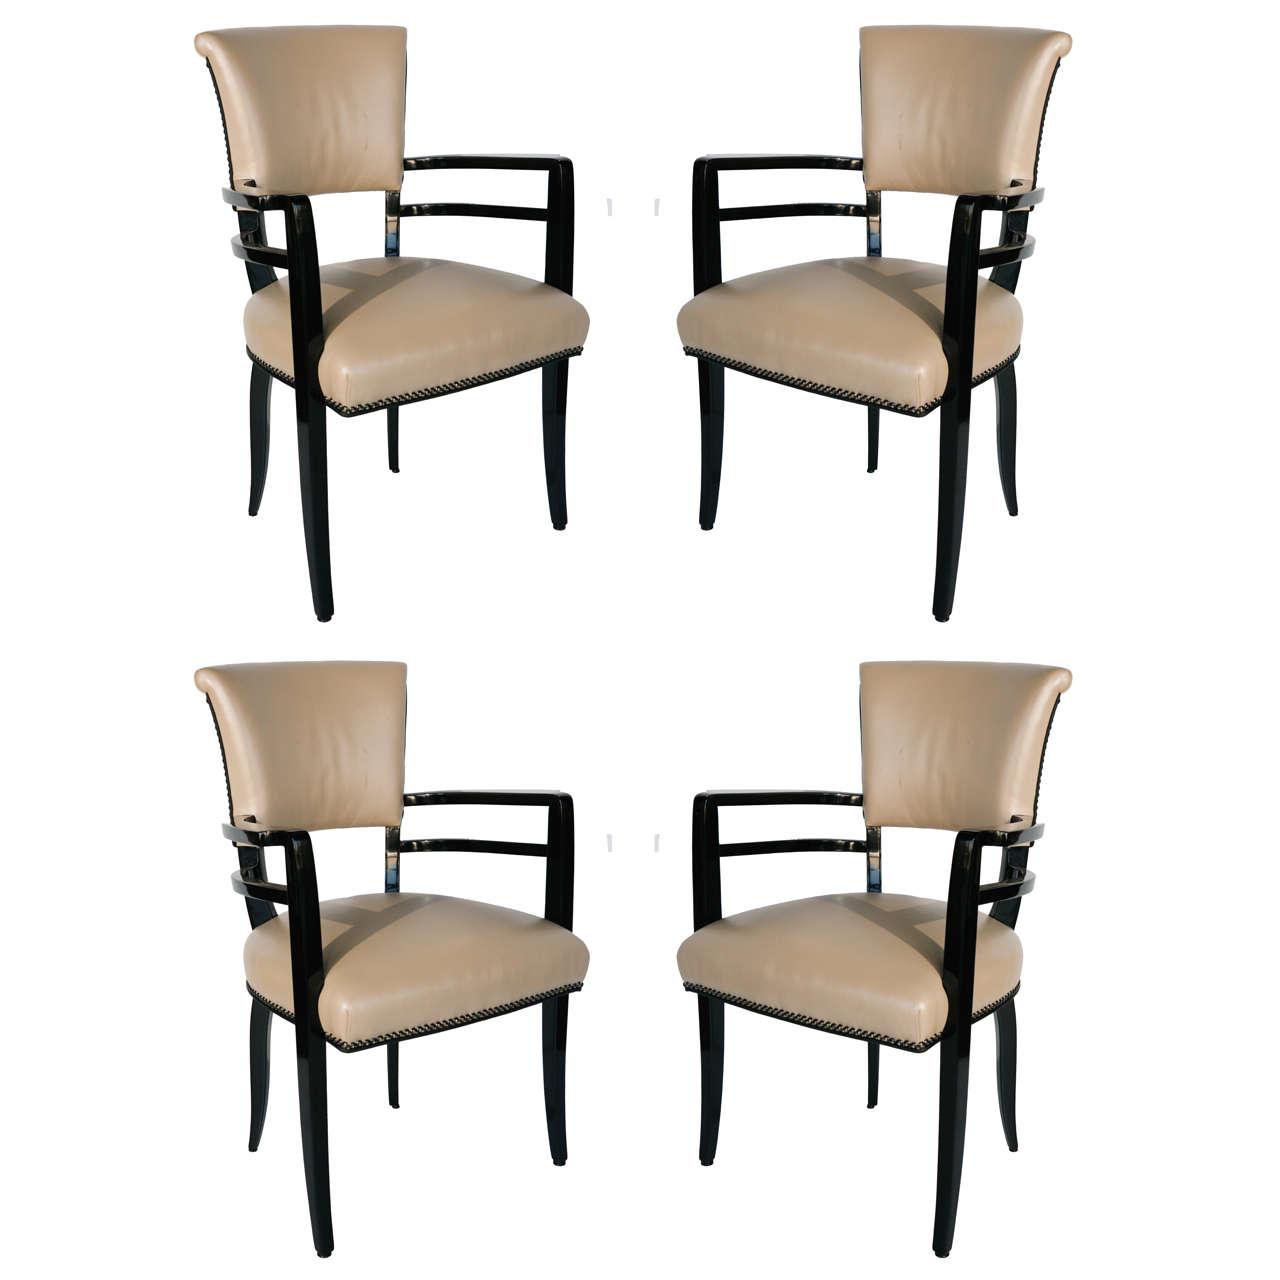 Outstanding Set of 4 Josef Hoffmann Chairs